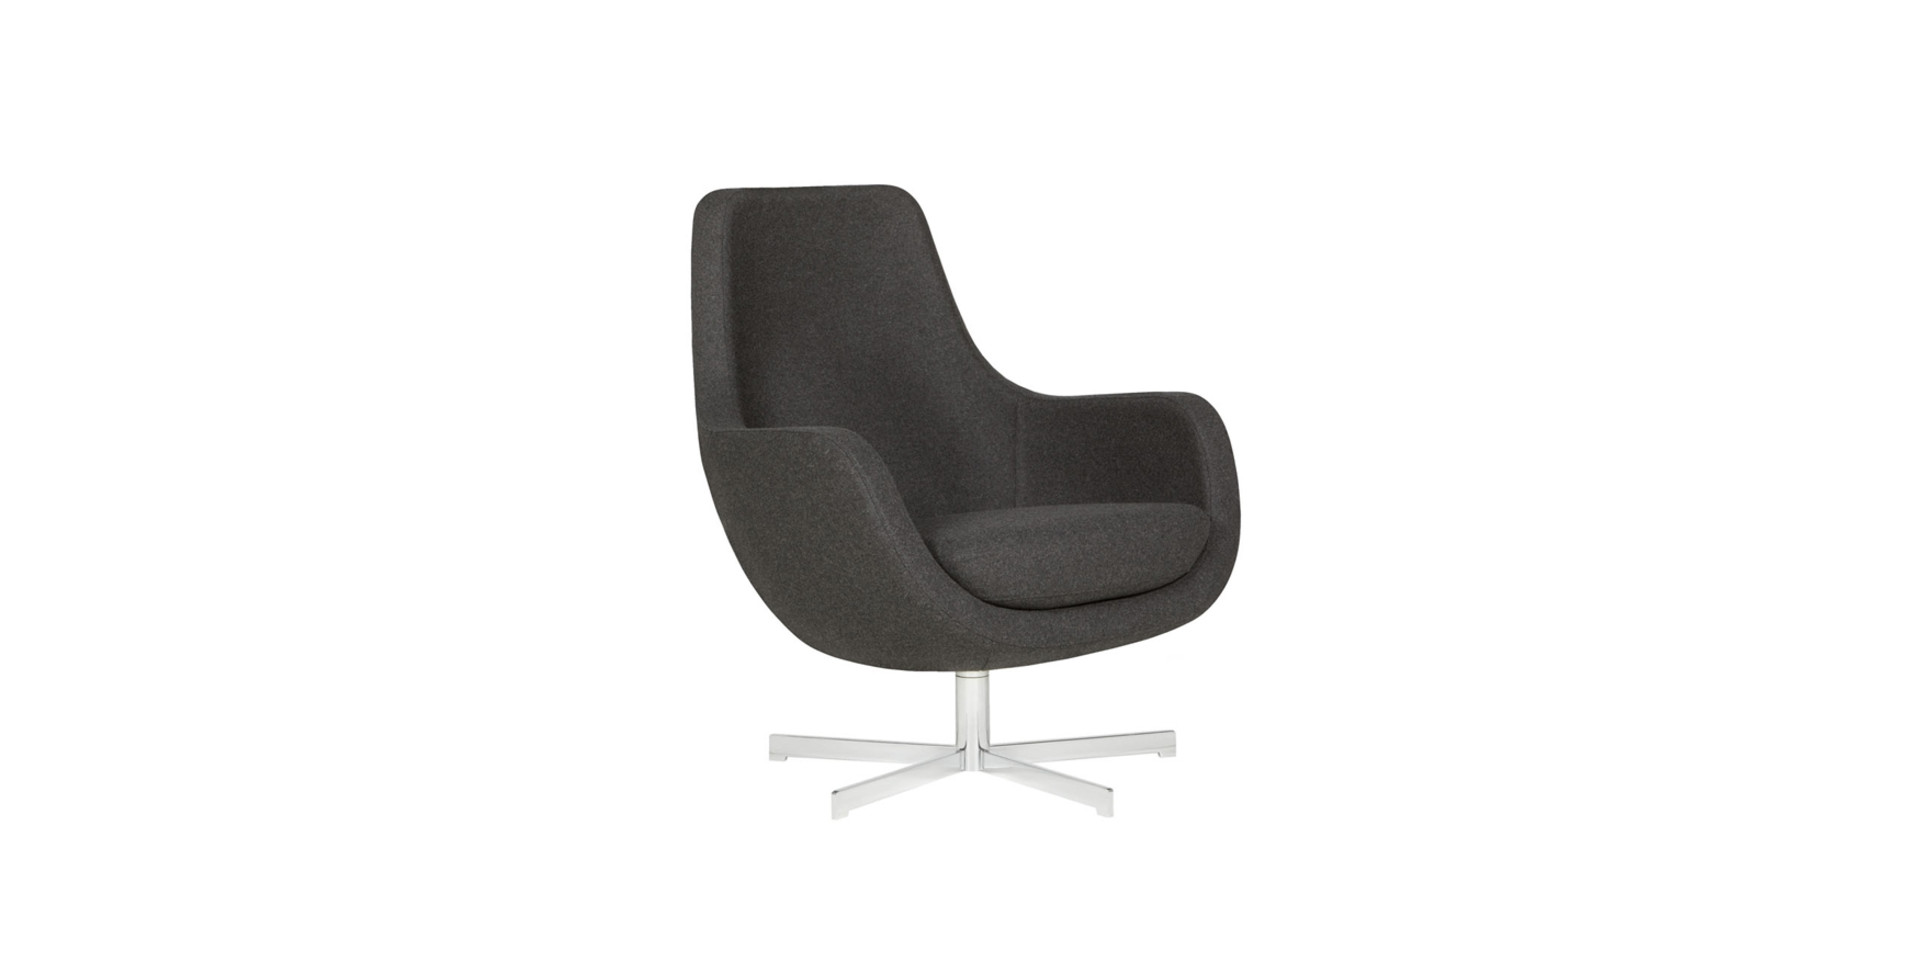 sits-stefani-fauteuil-armchair_swivel_panno1002_charcoal_2